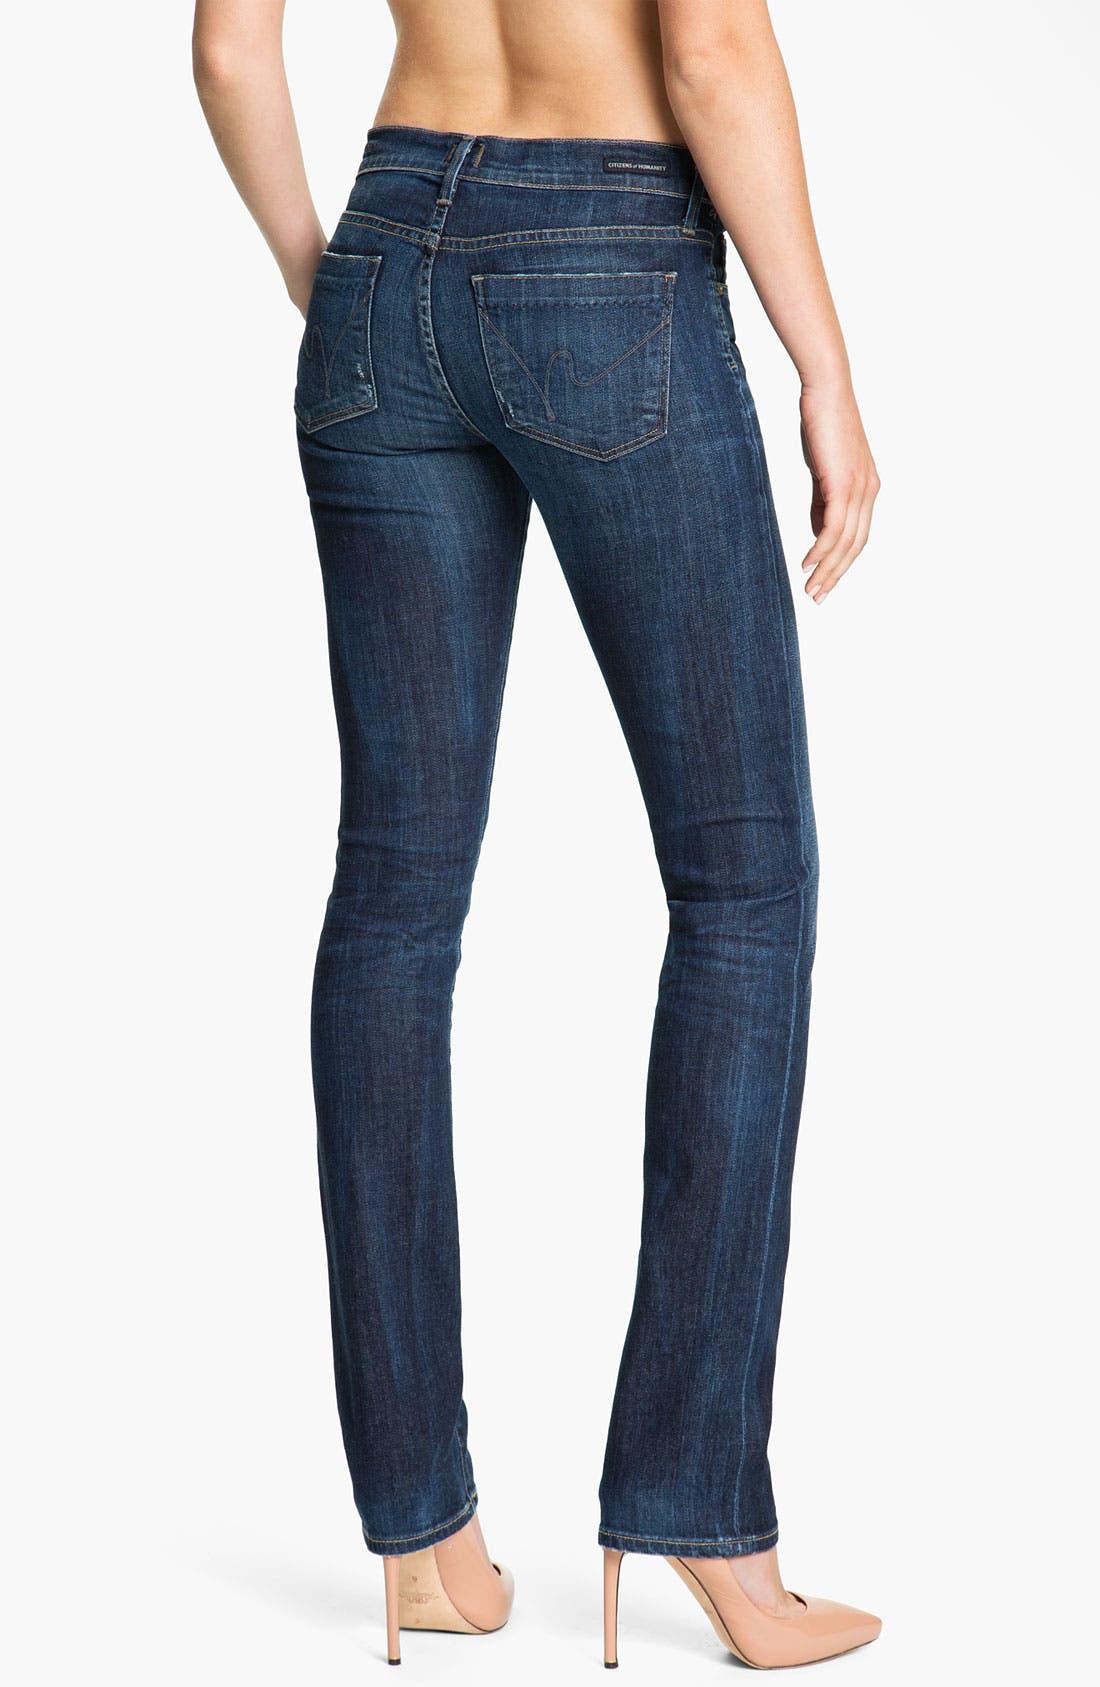 Alternate Image 2  - Citizens of Humanity 'Ava' Straight Leg Stretch Denim Jeans (New Spectrum)